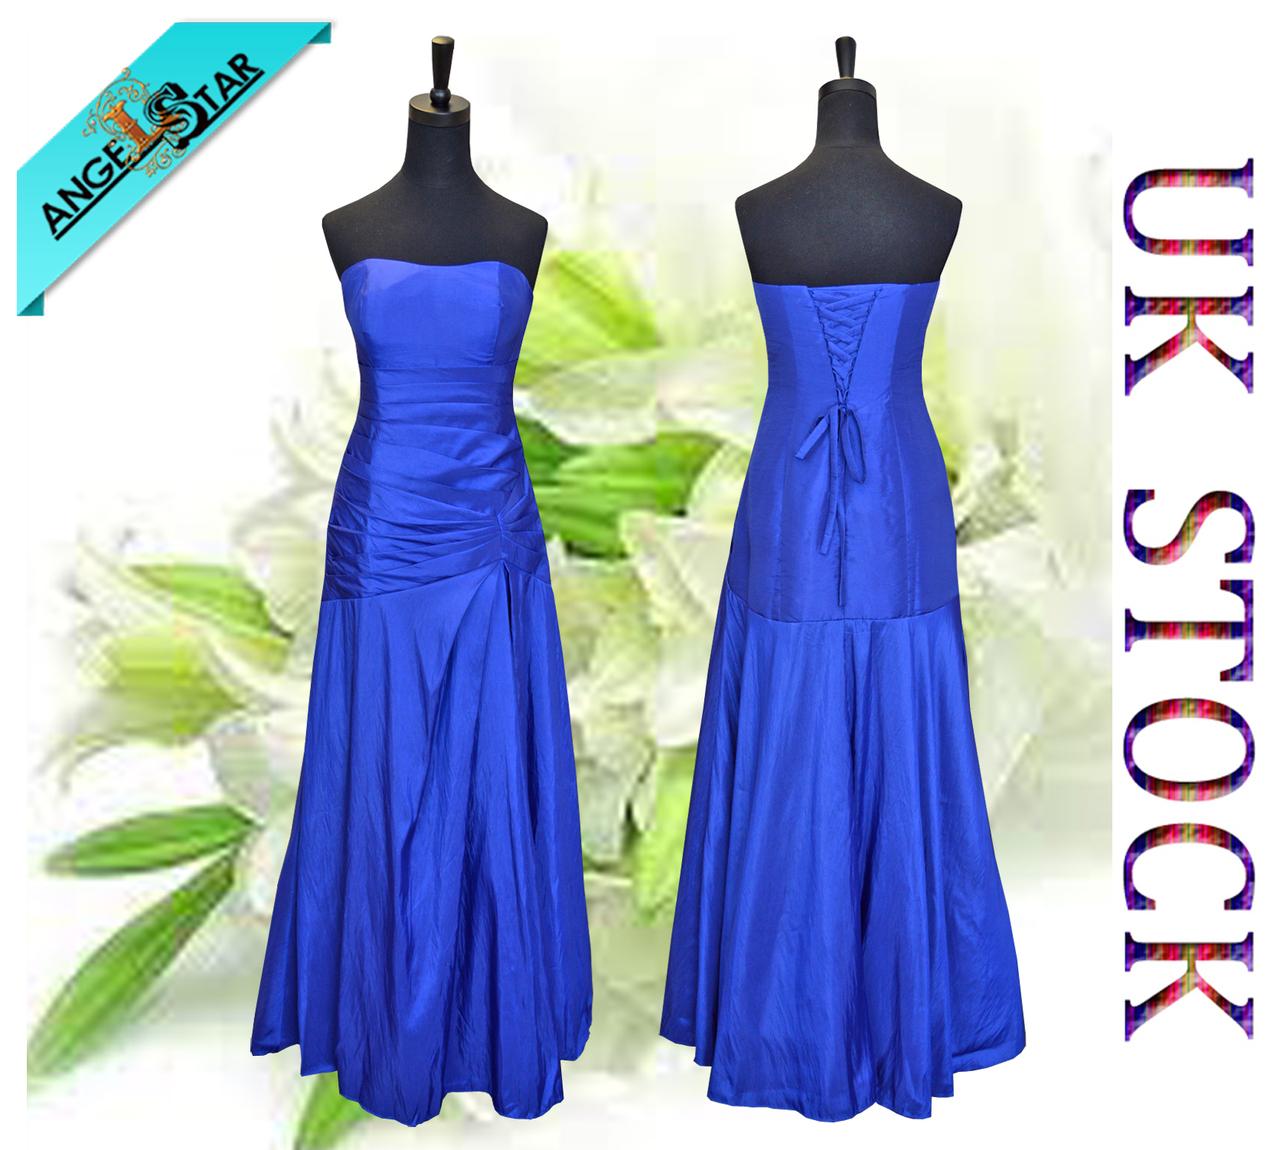 Chaming Taffeta Royal Blue Floor Length Bridesmaid/Evening/Wedding Party Dress